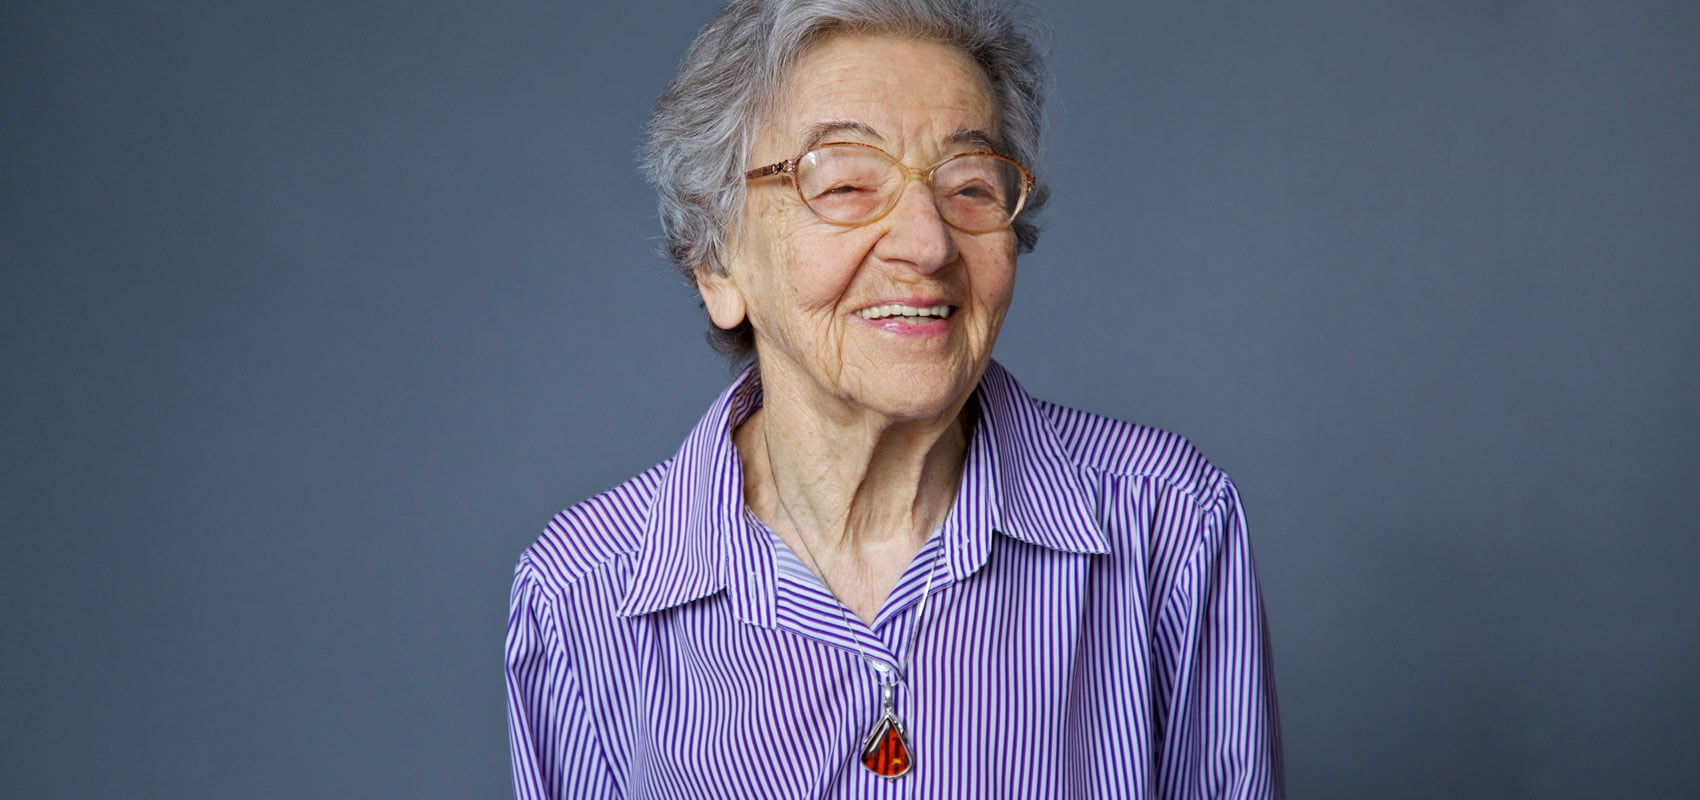 Remembering University Professor Emerita Ursula Franklin